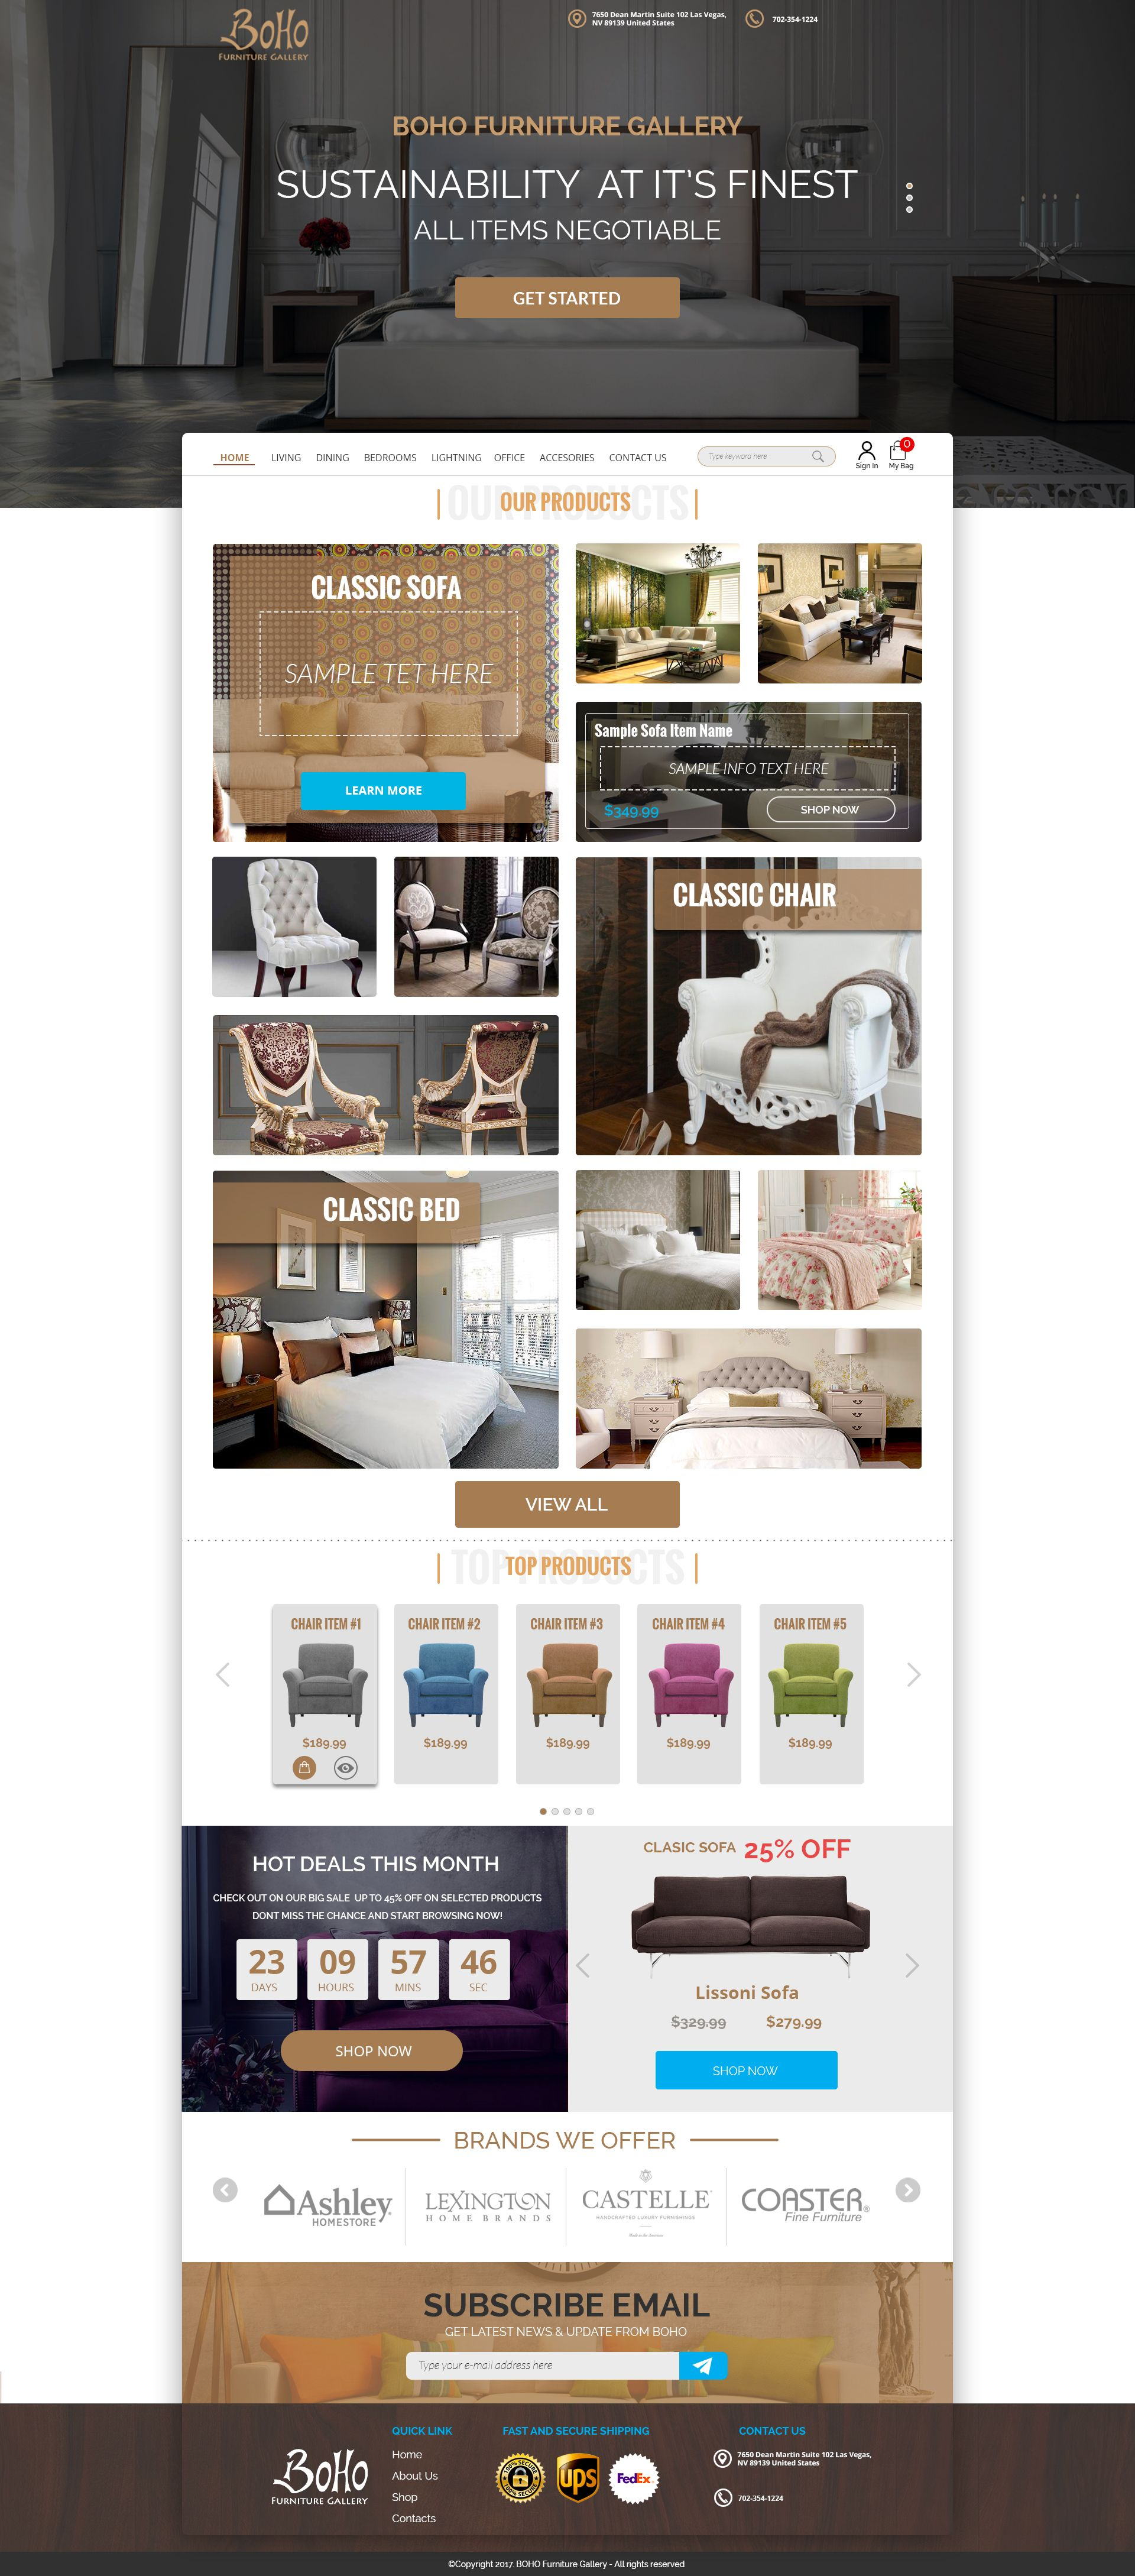 Boho Furniture Gallery Web Design